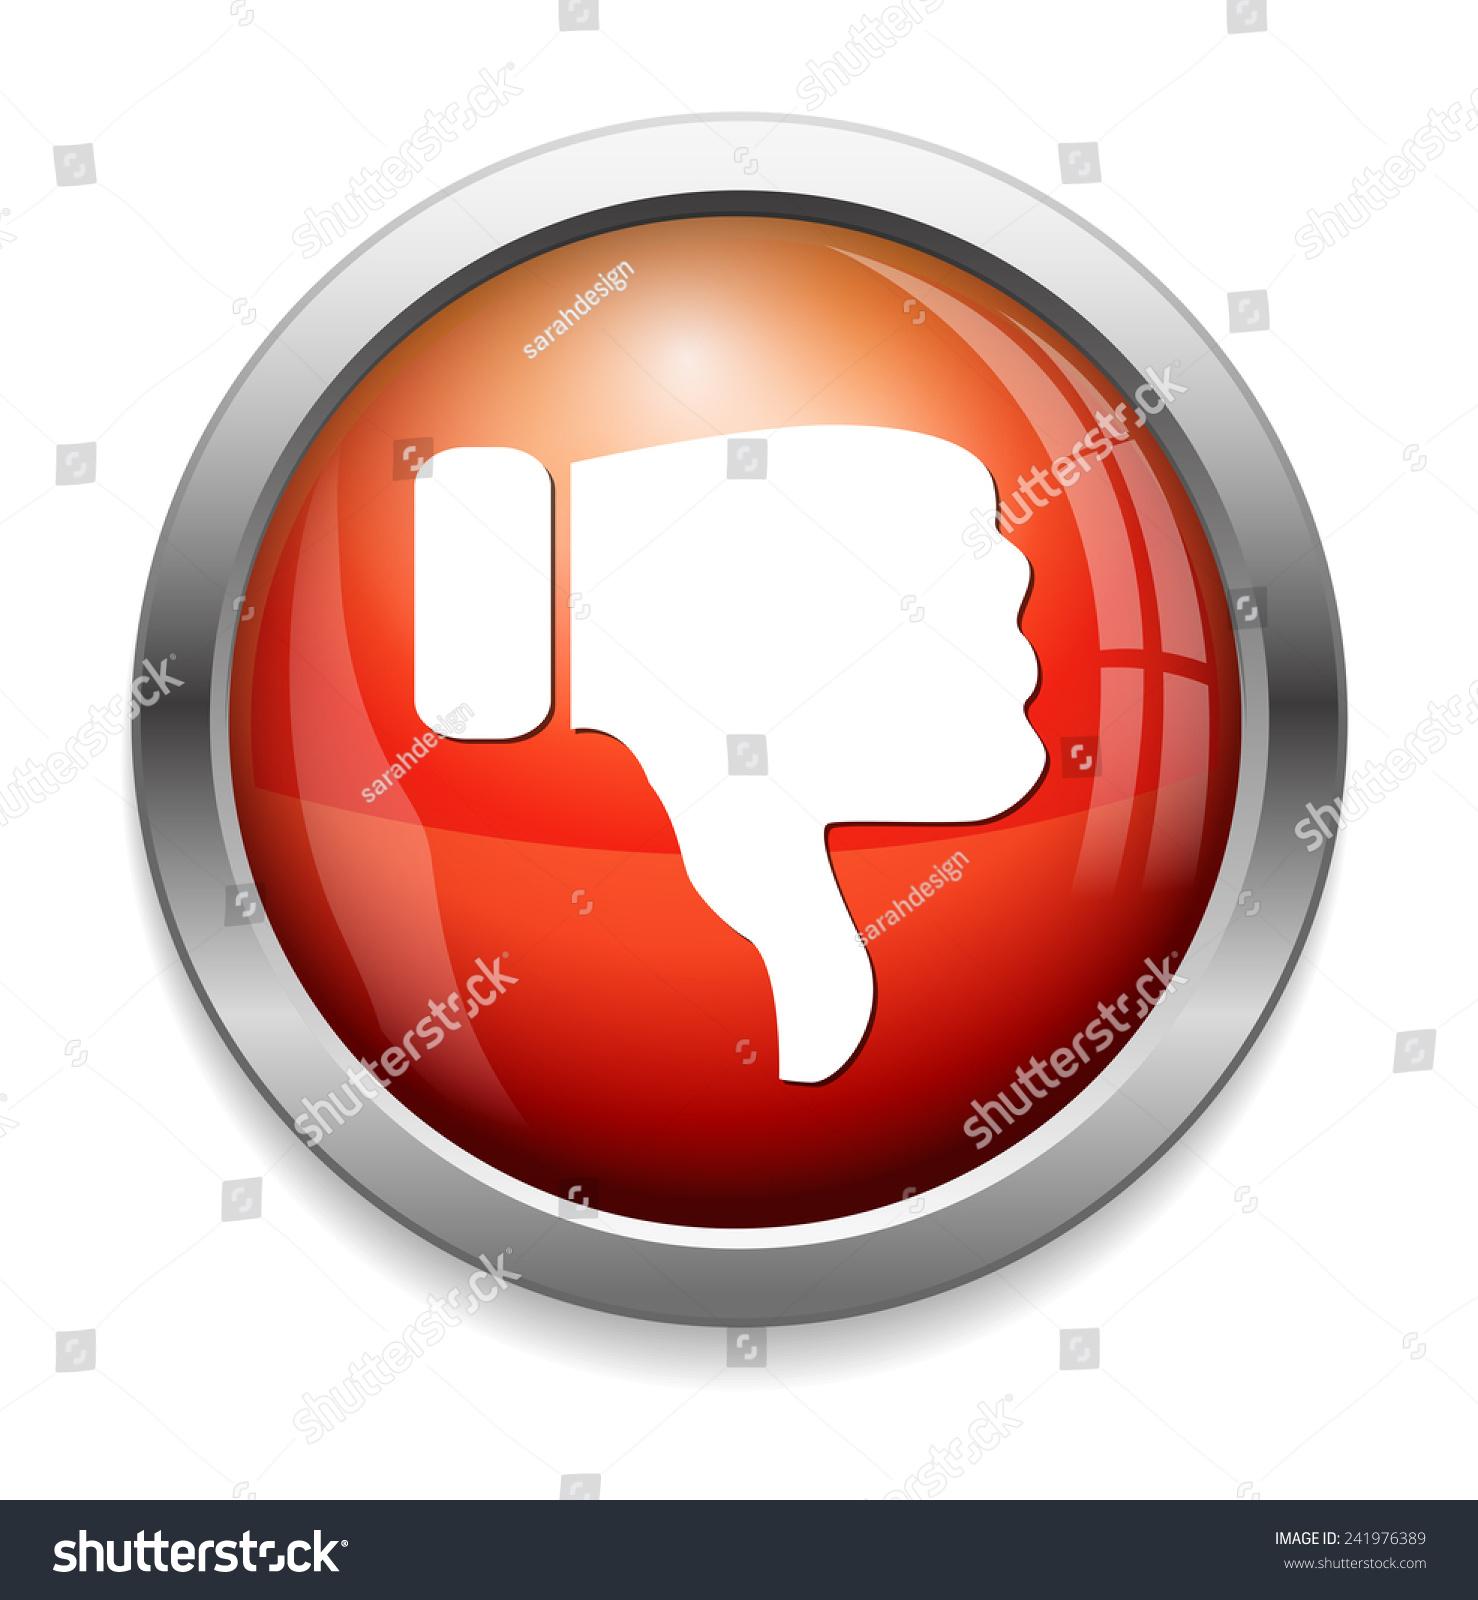 foto de Dislike (Thumbs Down Icon) Stock Photo 241976389